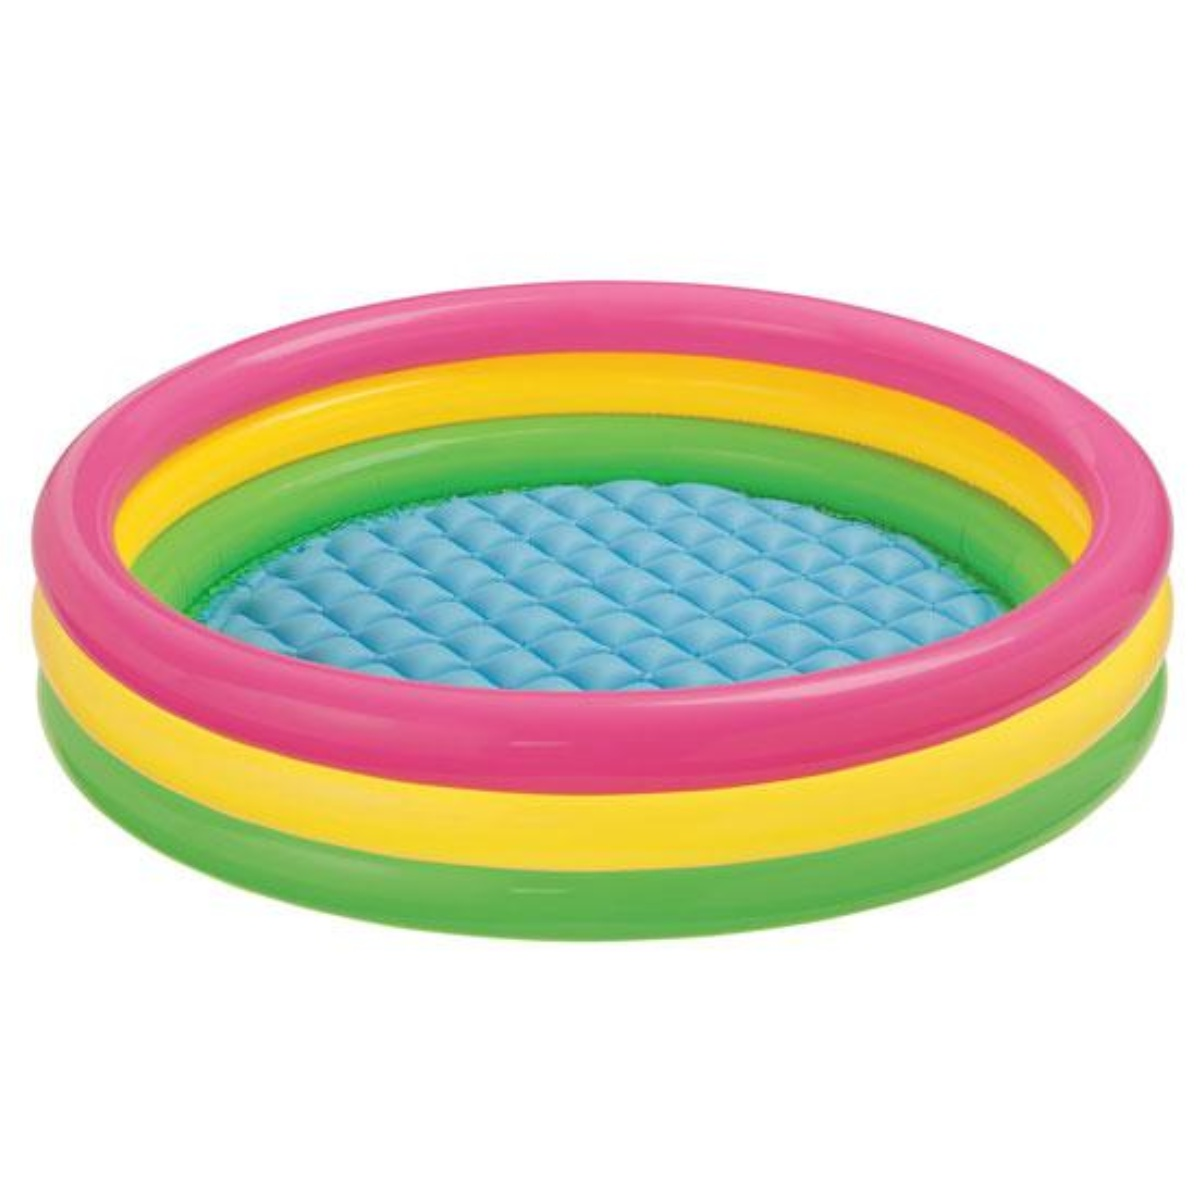 Nafukovací bazén INTEX Soft dno 114 x 25 cm